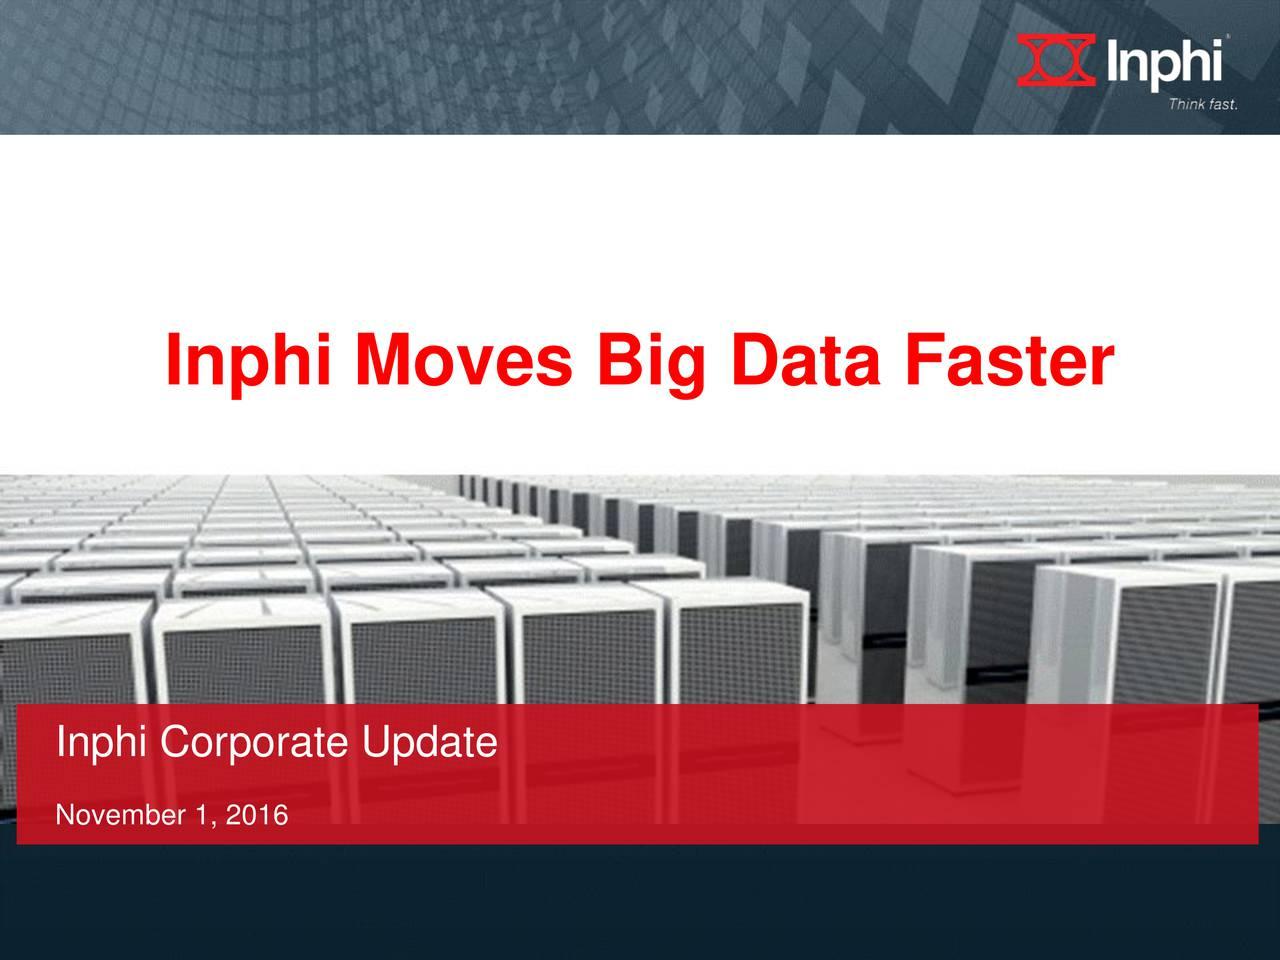 Inphi Corporate Update November 1, 2016